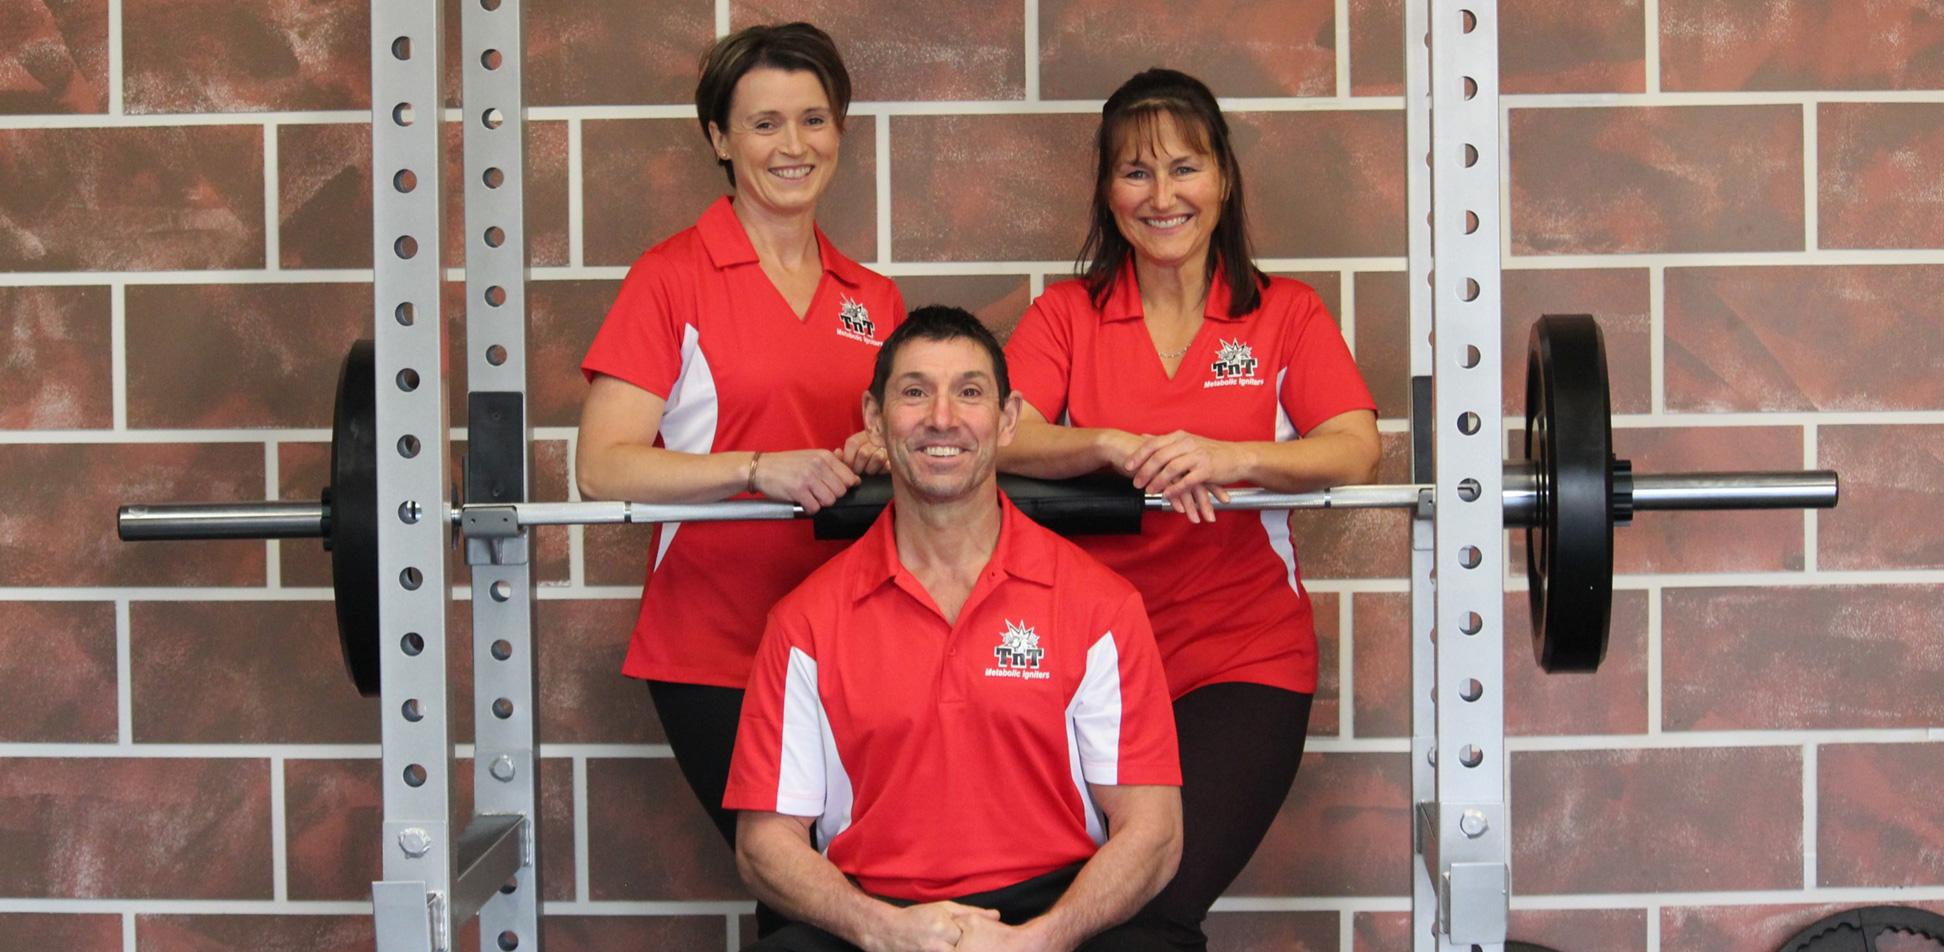 TnT Metabolic Igniters - Team Photo